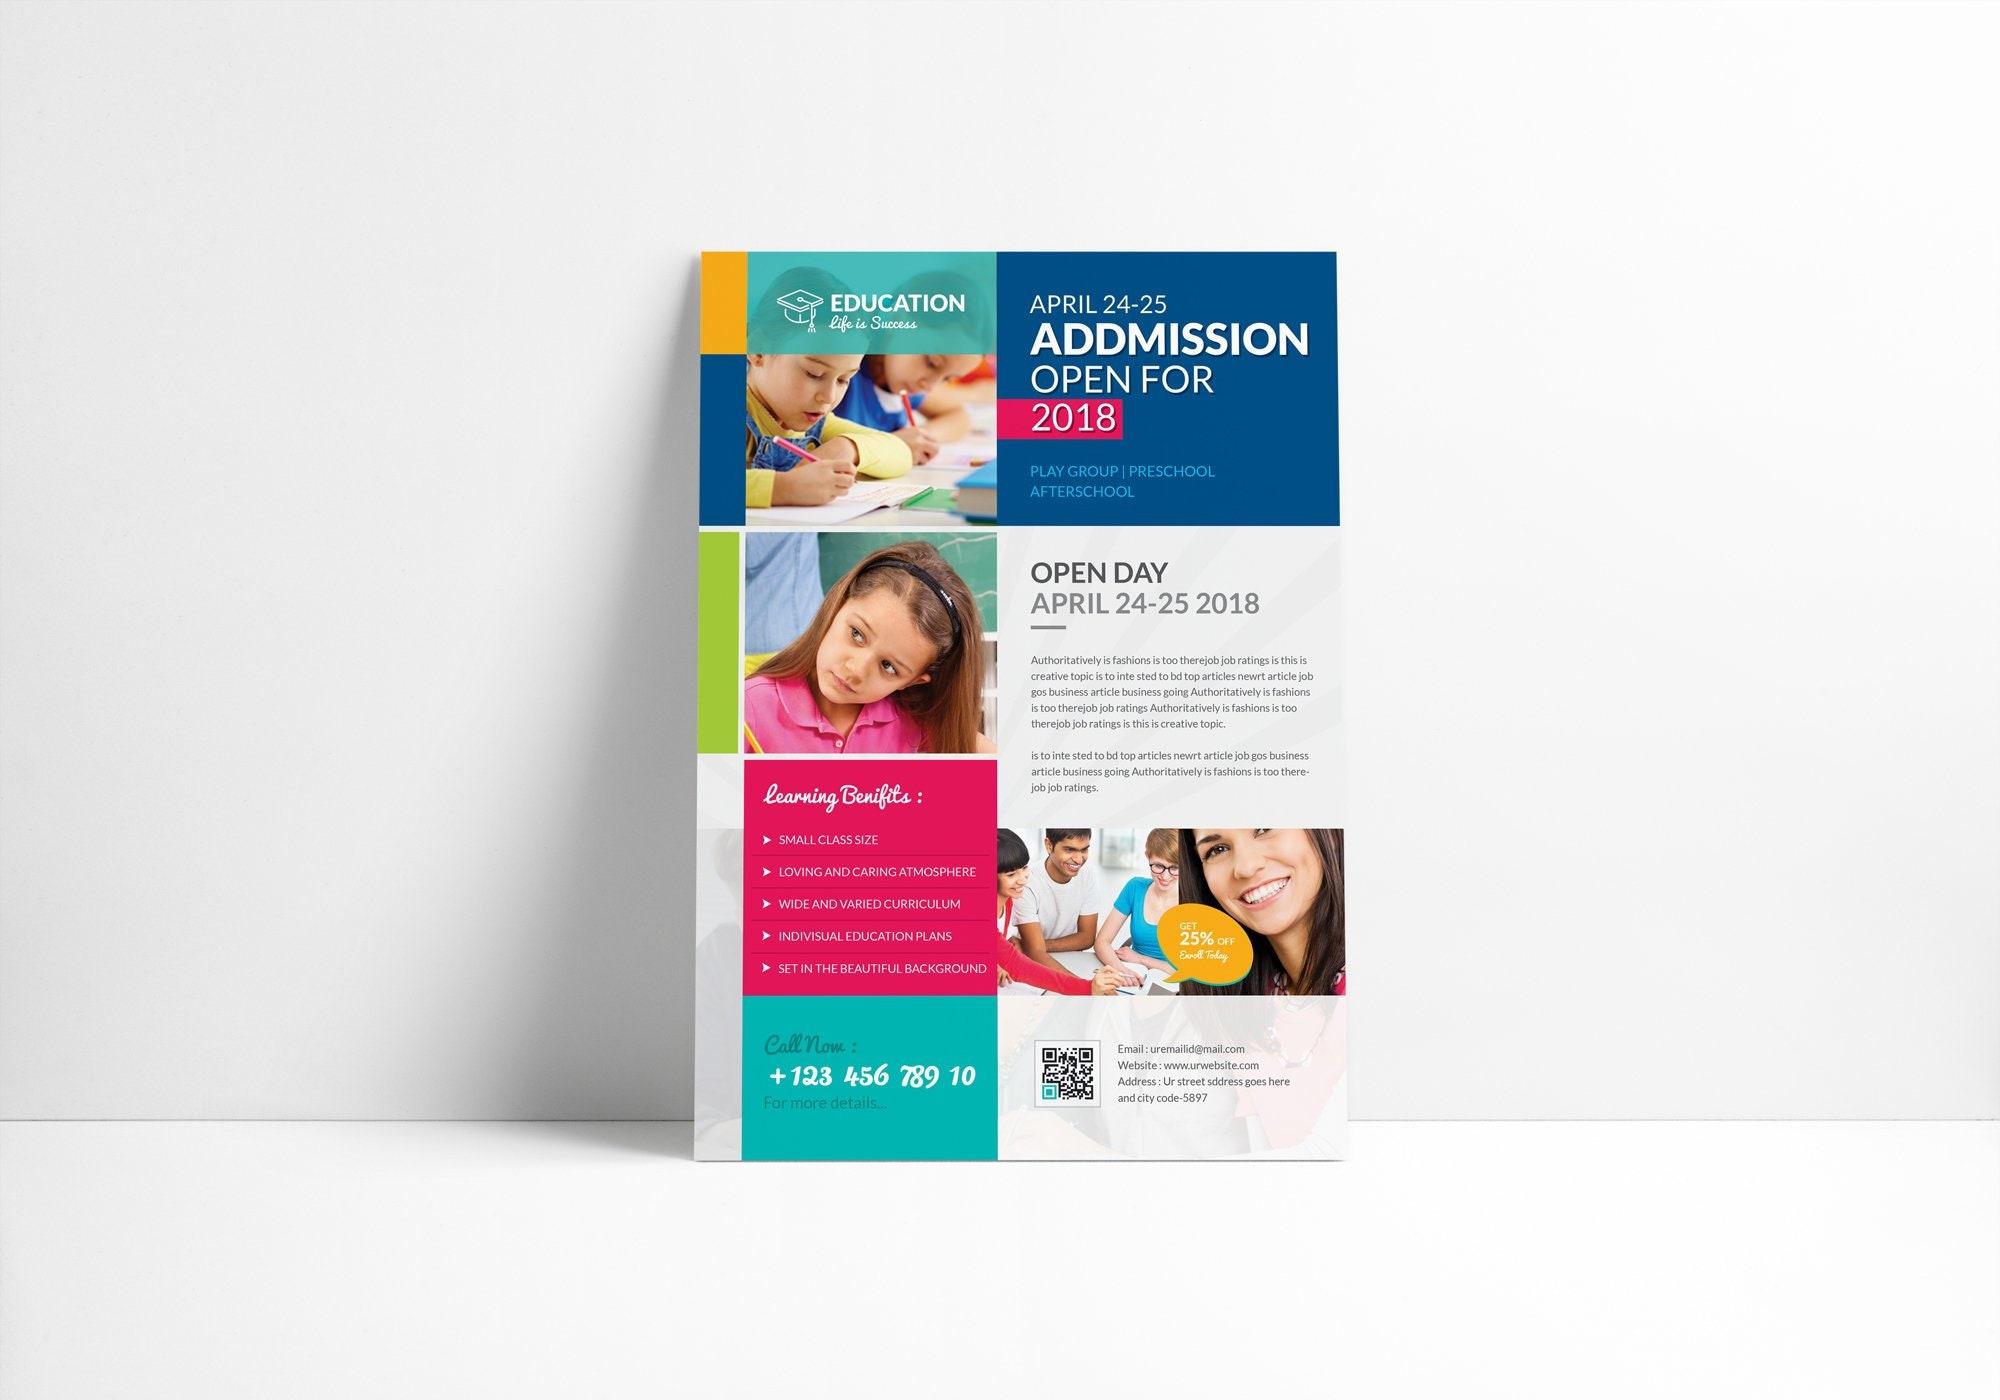 Admission Open School Flyer Flyer Templates Creative - Newletterjdi co